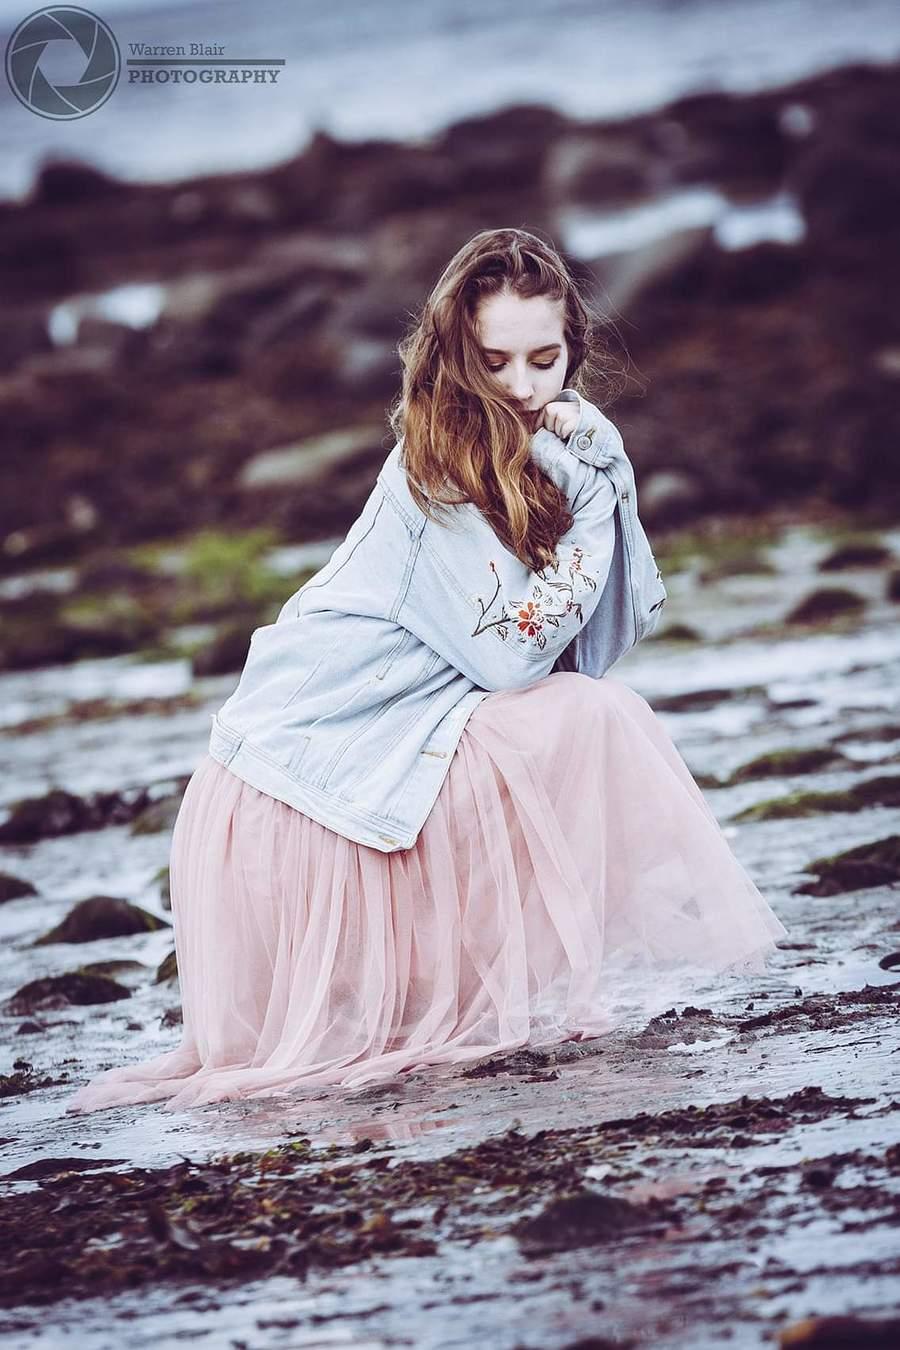 Model Dove-ish / Uploaded 15th January 2019 @ 04:41 PM